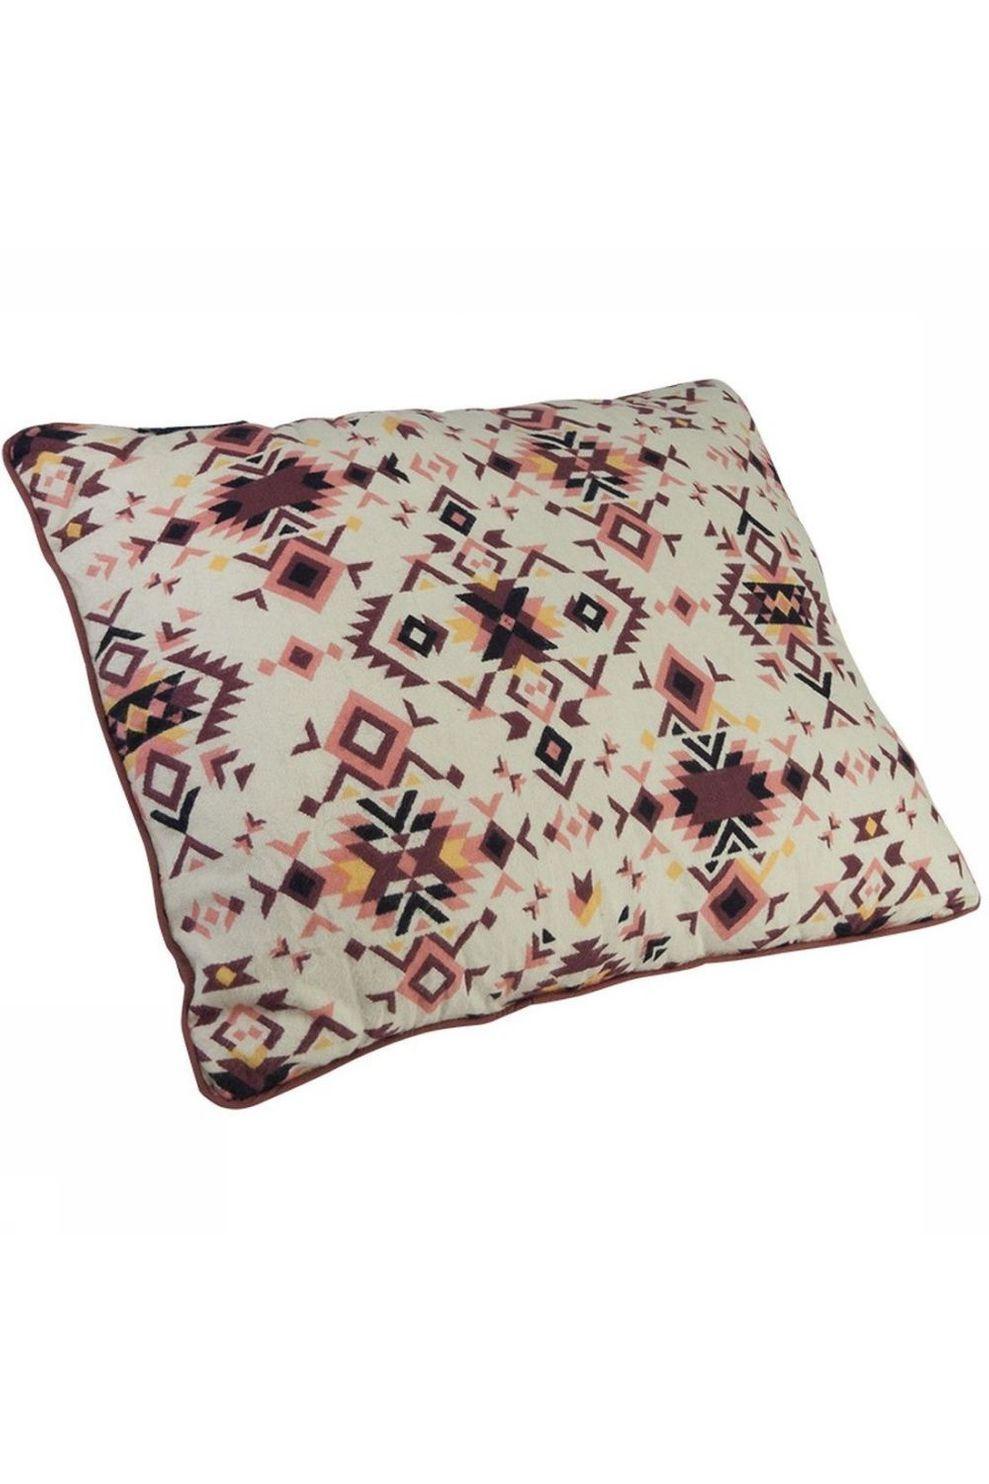 Nomad Kussen Travel Pillow - Roze/ Gemengd